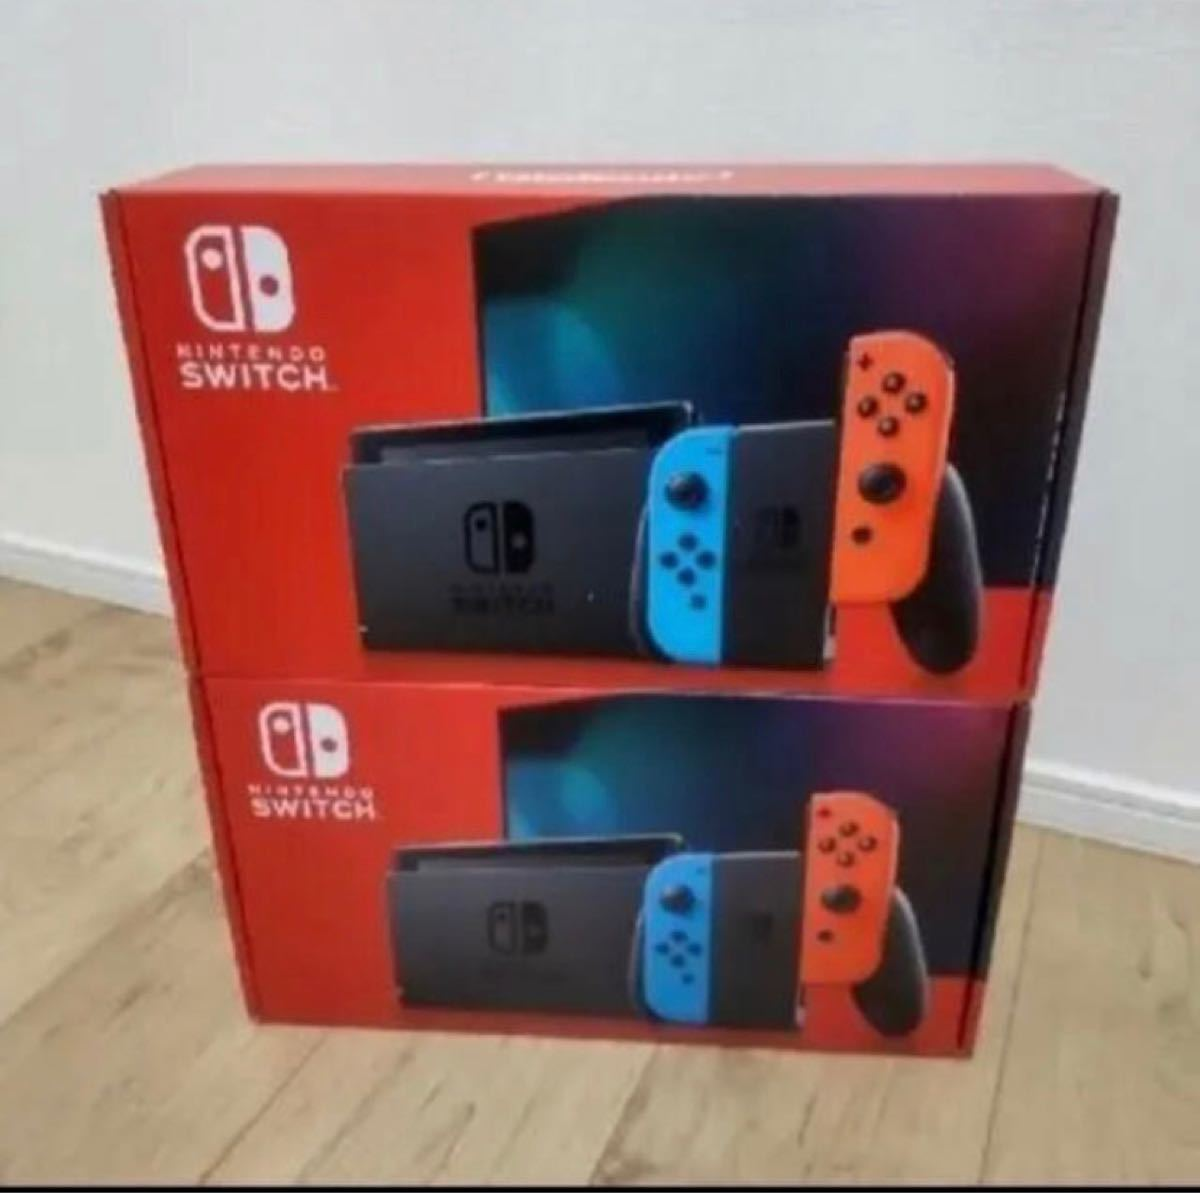 Nintendo Switch ネオンカラー 2台セット 未使用新品 店舗印無